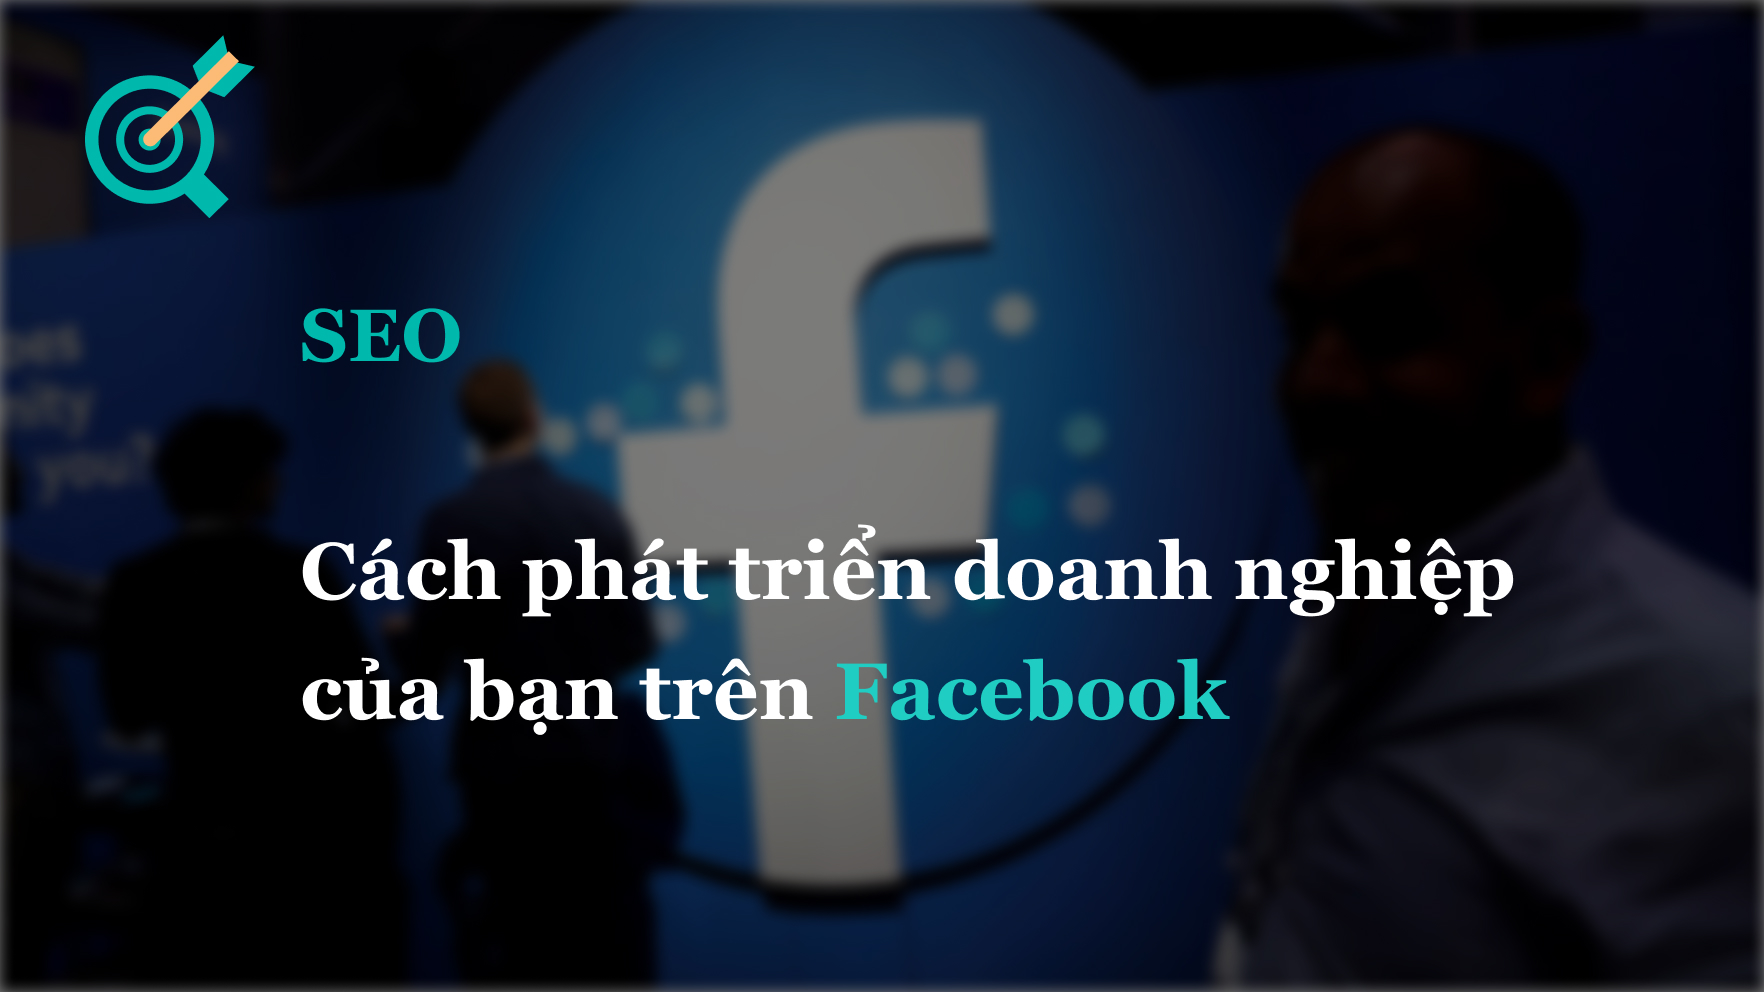 FanPage: Hướng dẫn phát triển doanh nghiệp trên Facebook từ A – Z